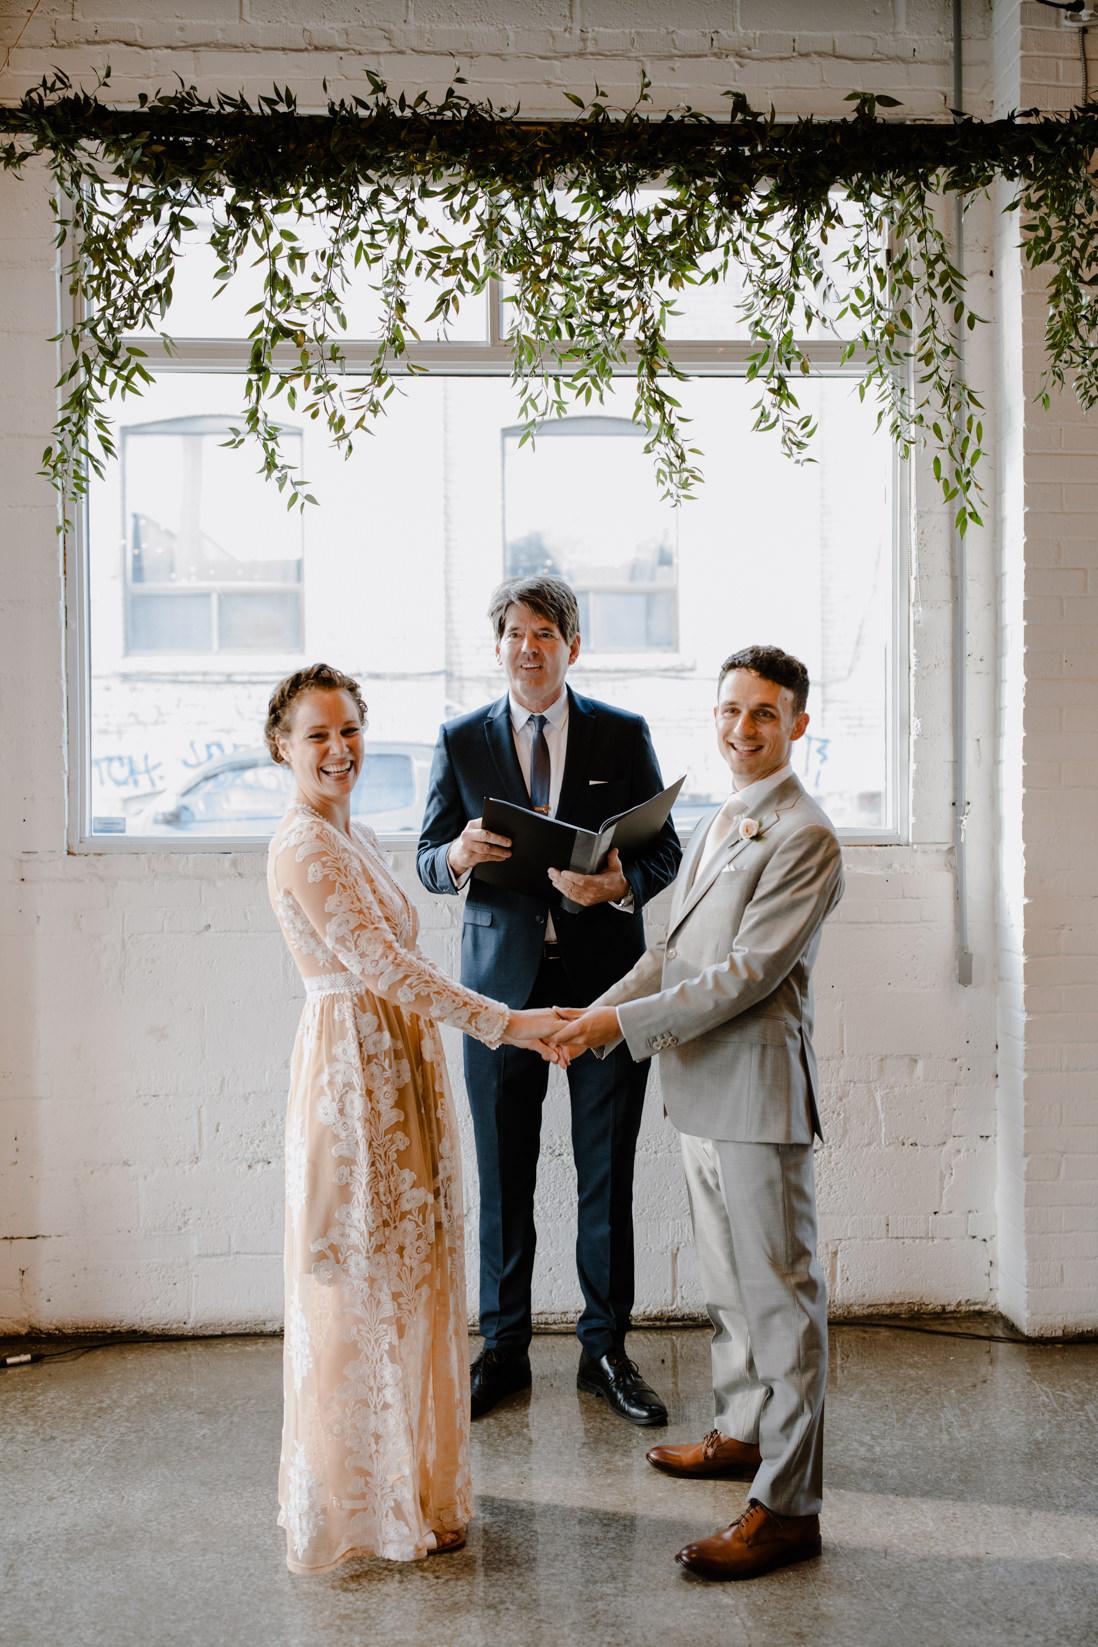 italian ruscus backdrop wedding ceremony Propeller Coffee Co Wedding Toronto_EightyFifth Street Photography